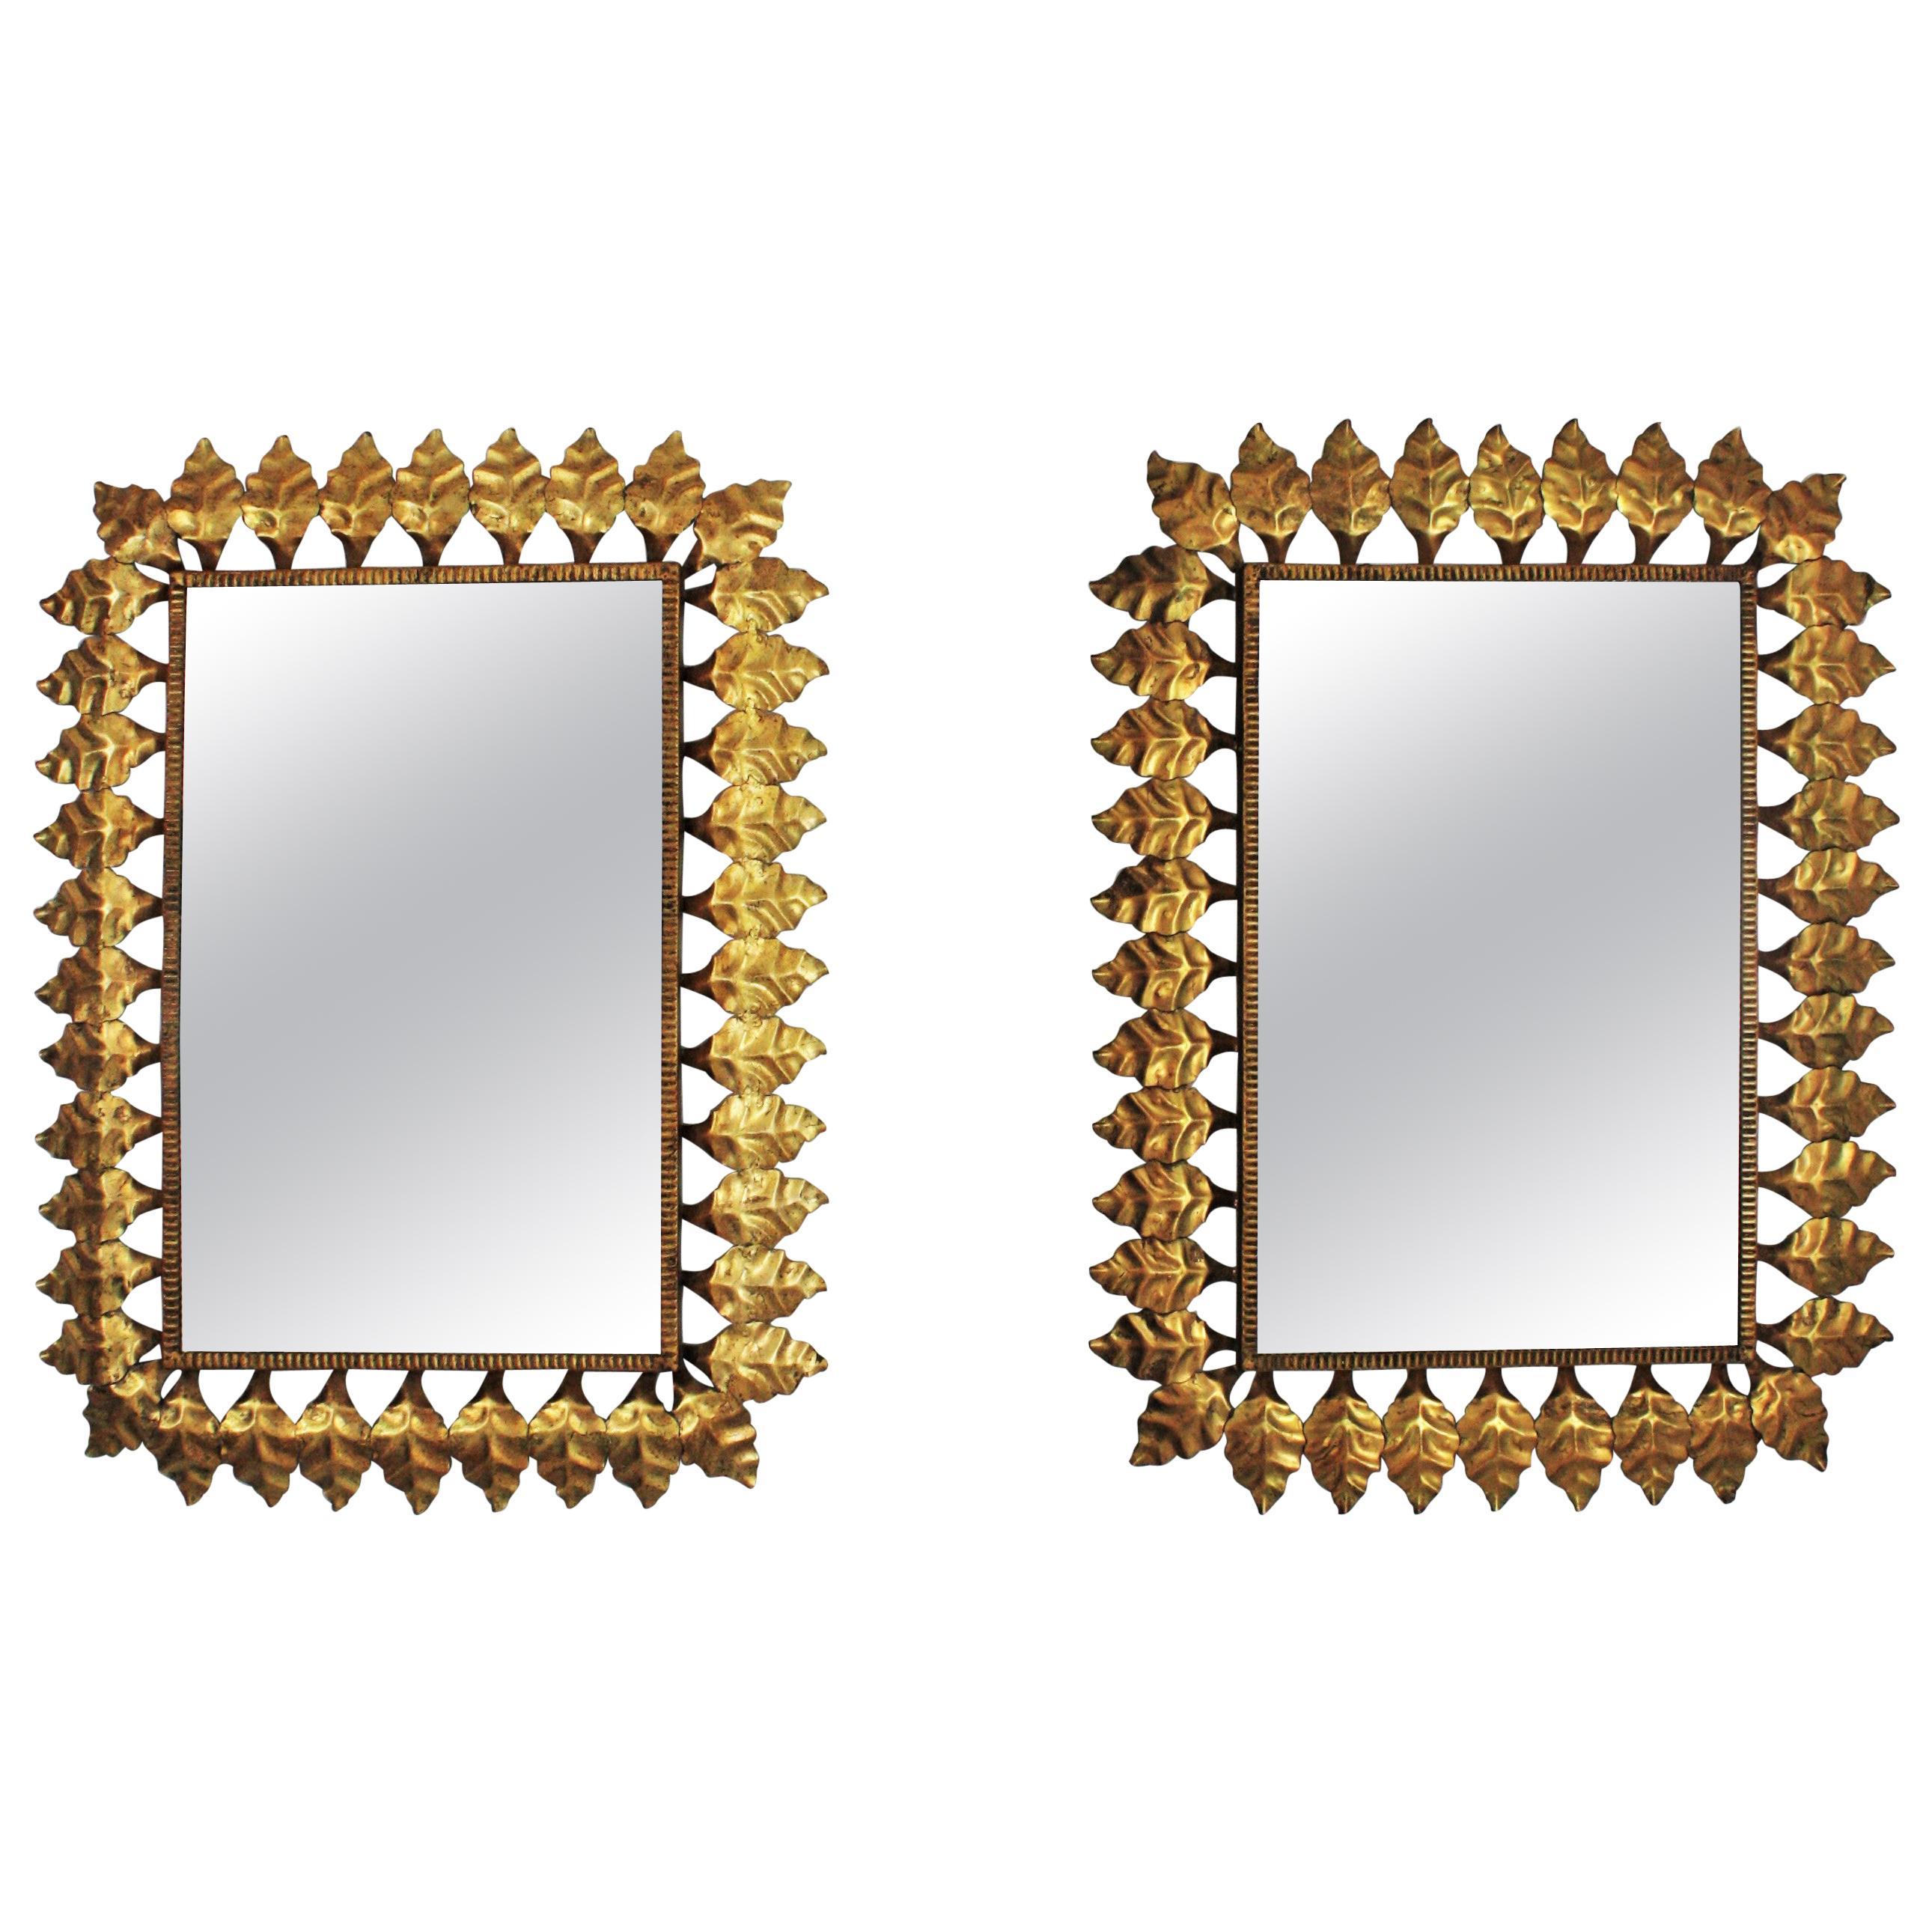 Pair of Sunburst Rectangular Mirrors in Gilt Iron